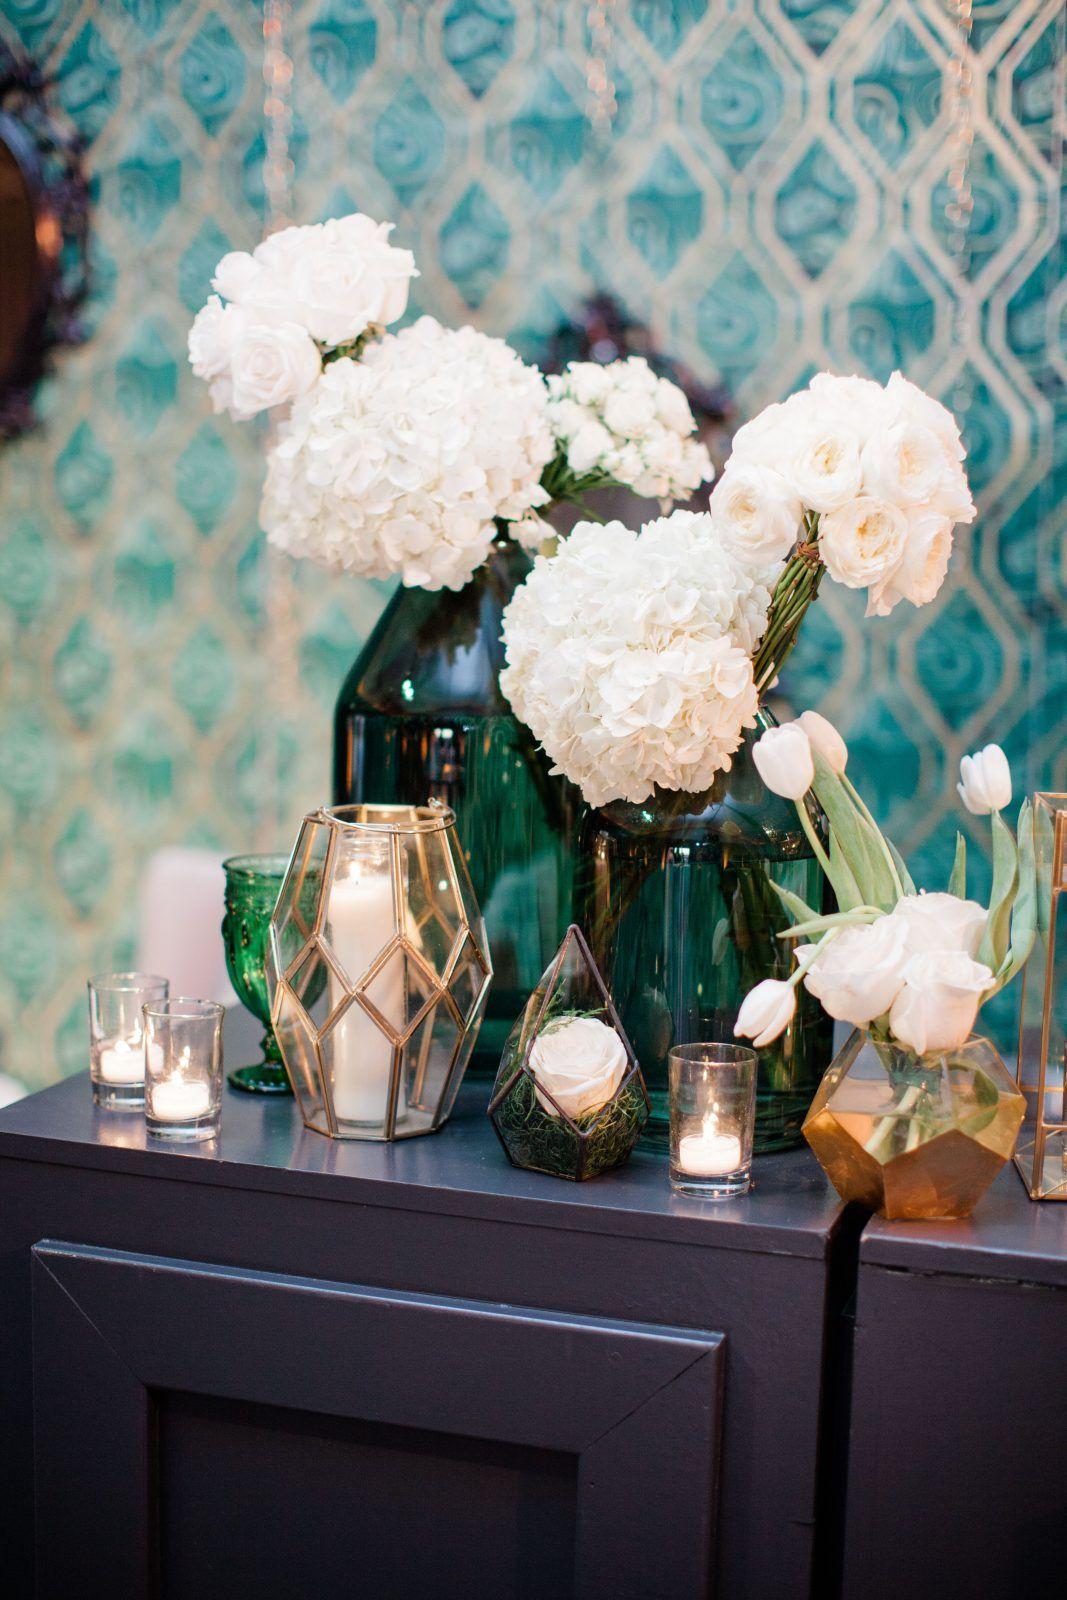 wedding coordinators in orange county ca%0A eventsbypurelavish com   Corporate Event  High Desert  Pure Lavish Events   Corporate Event